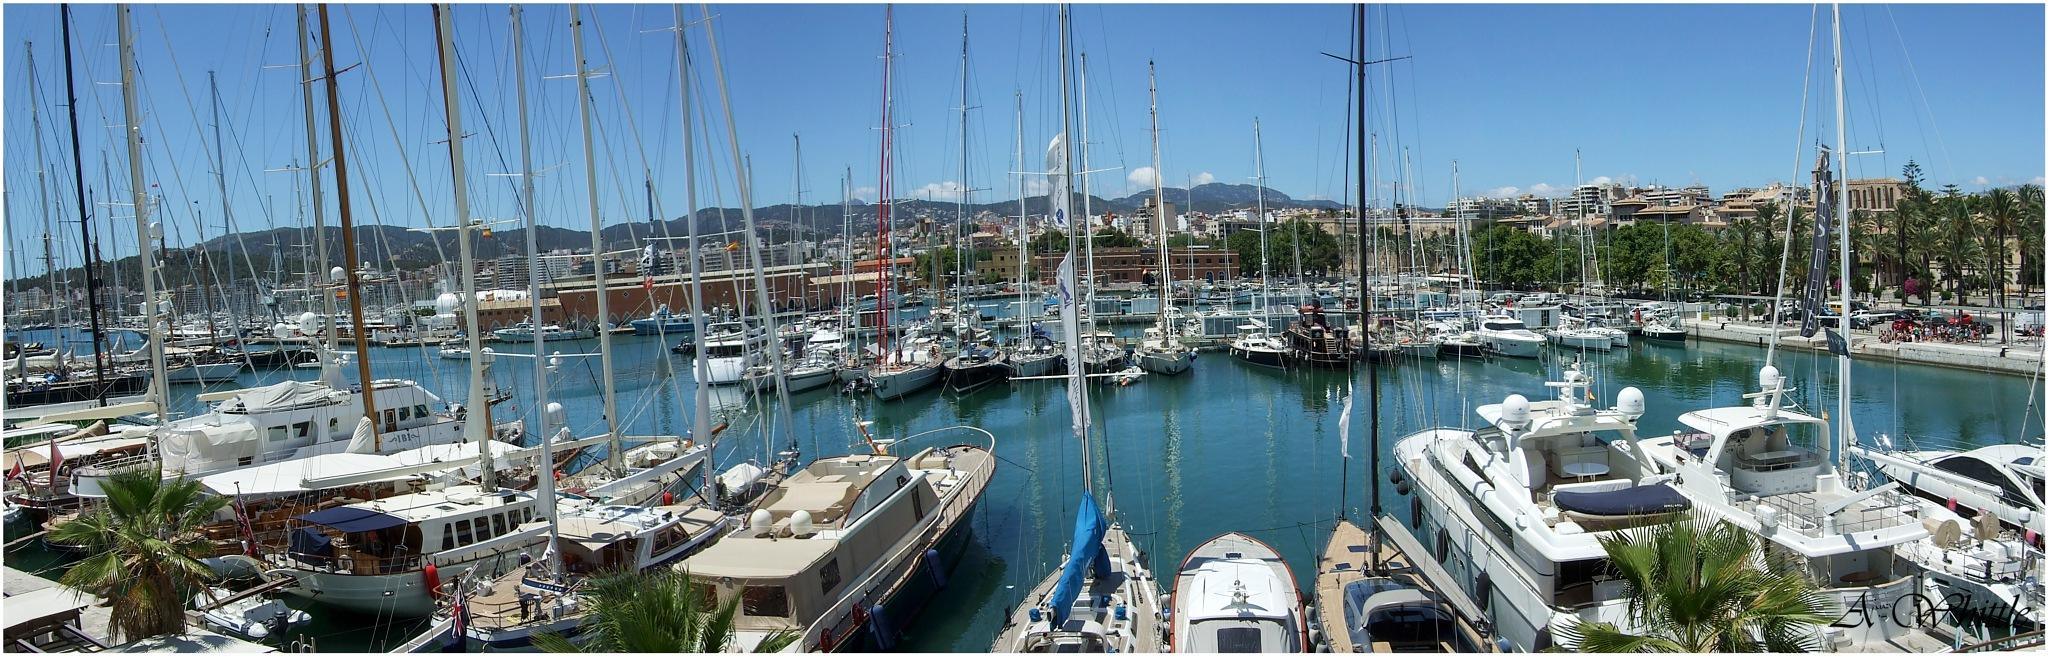 Marina Port de Mallorca by Andy Whittle